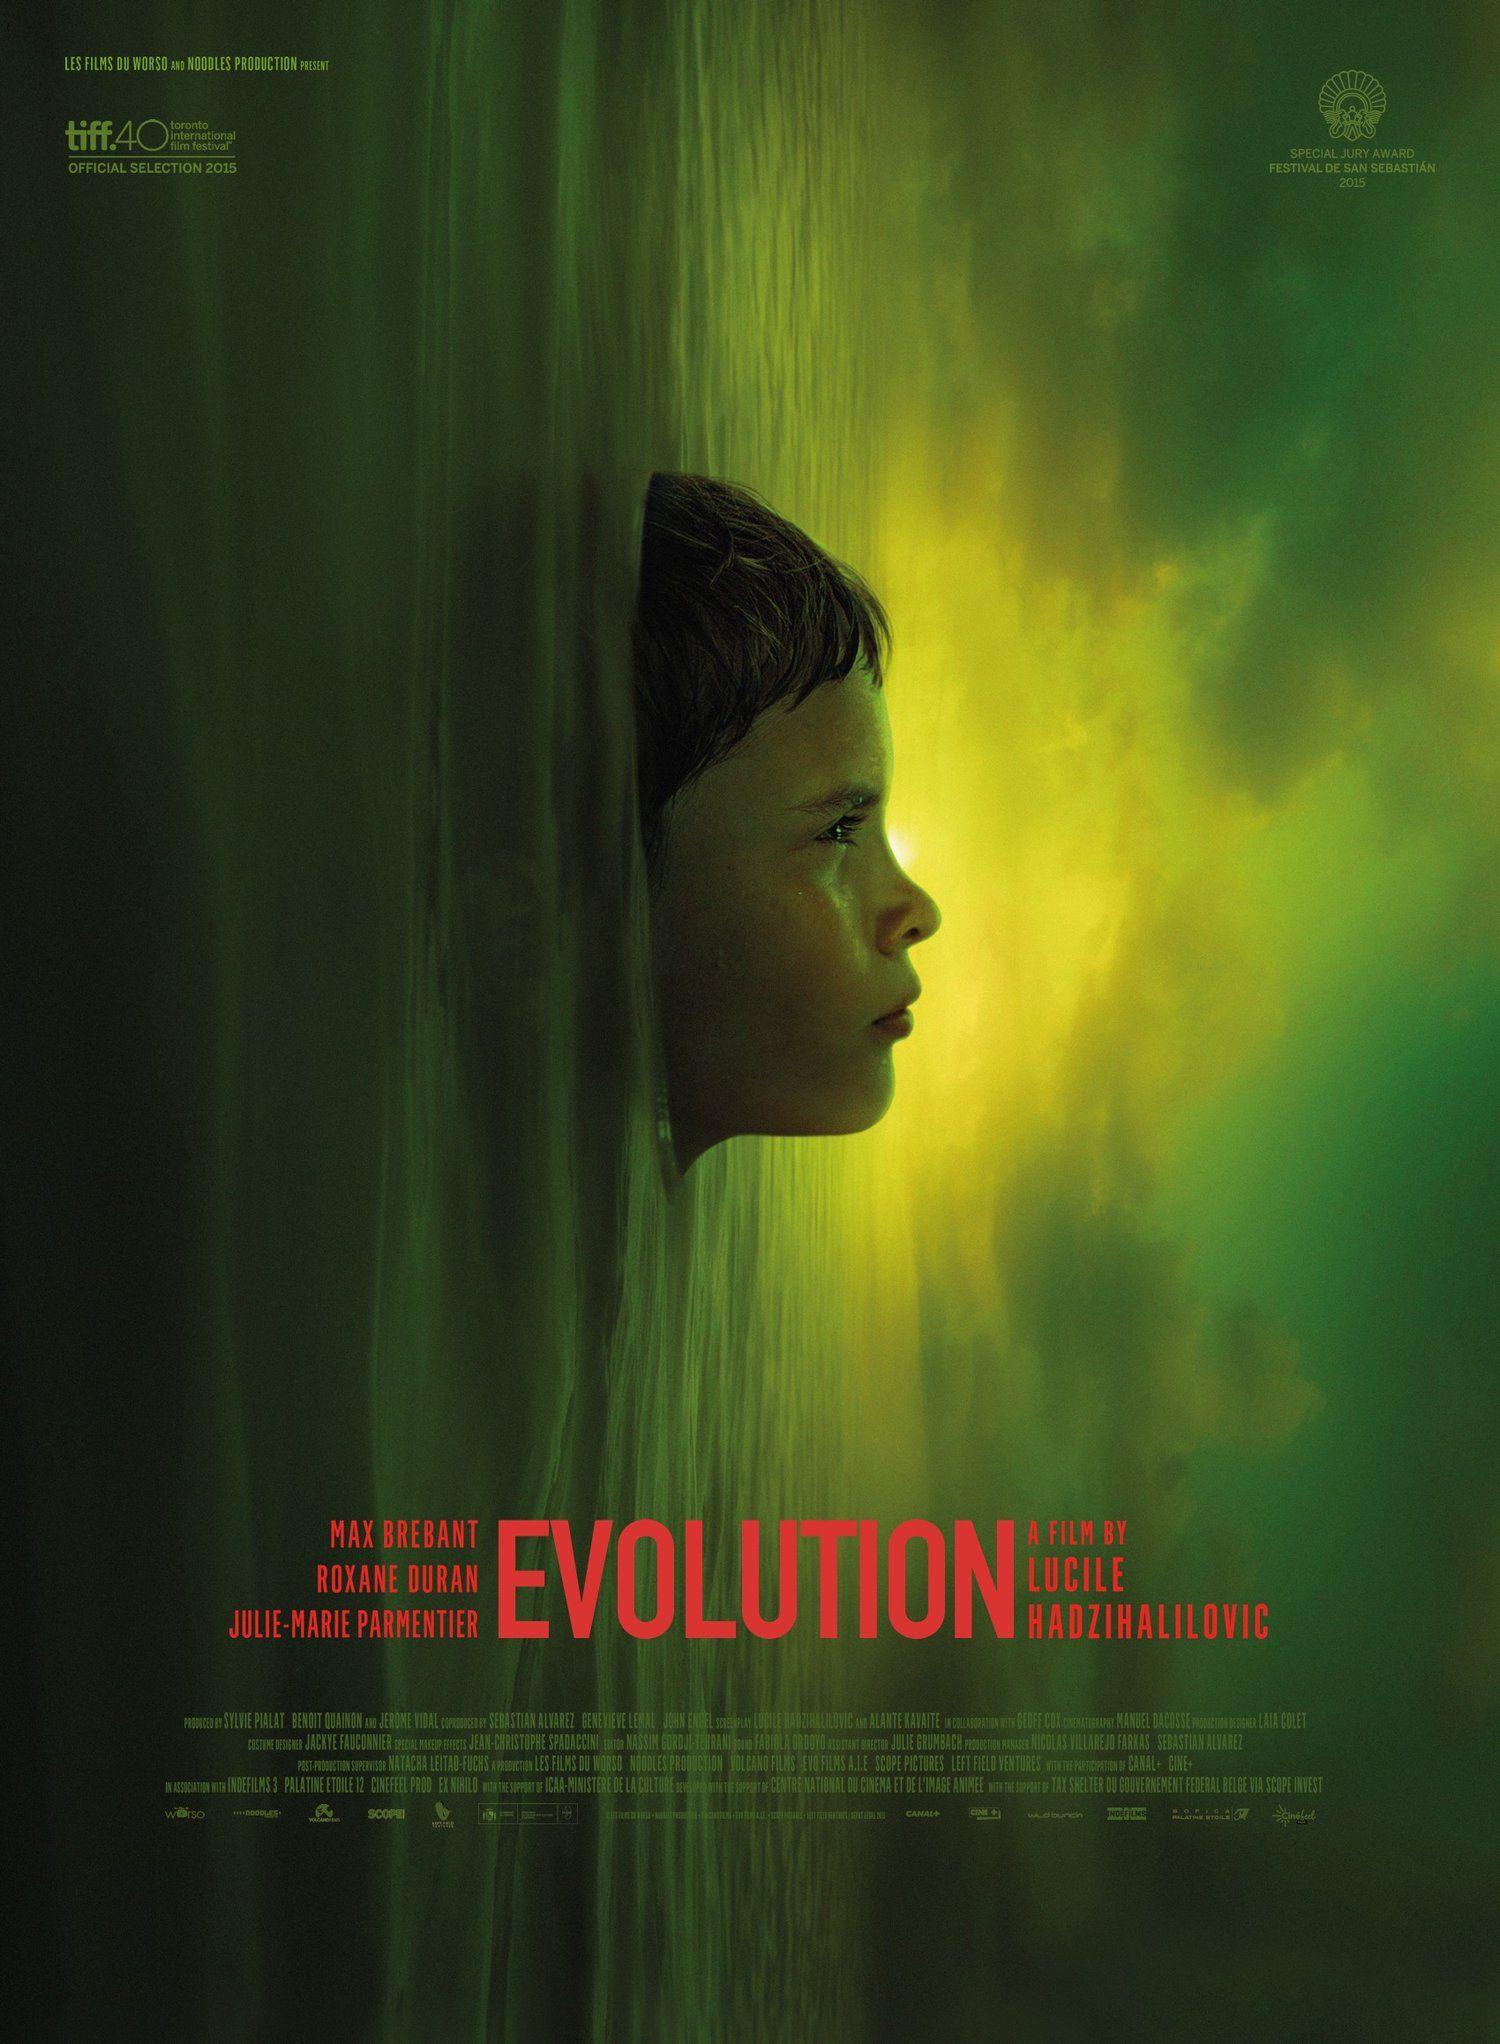 Movie sites as an evolution in cinema